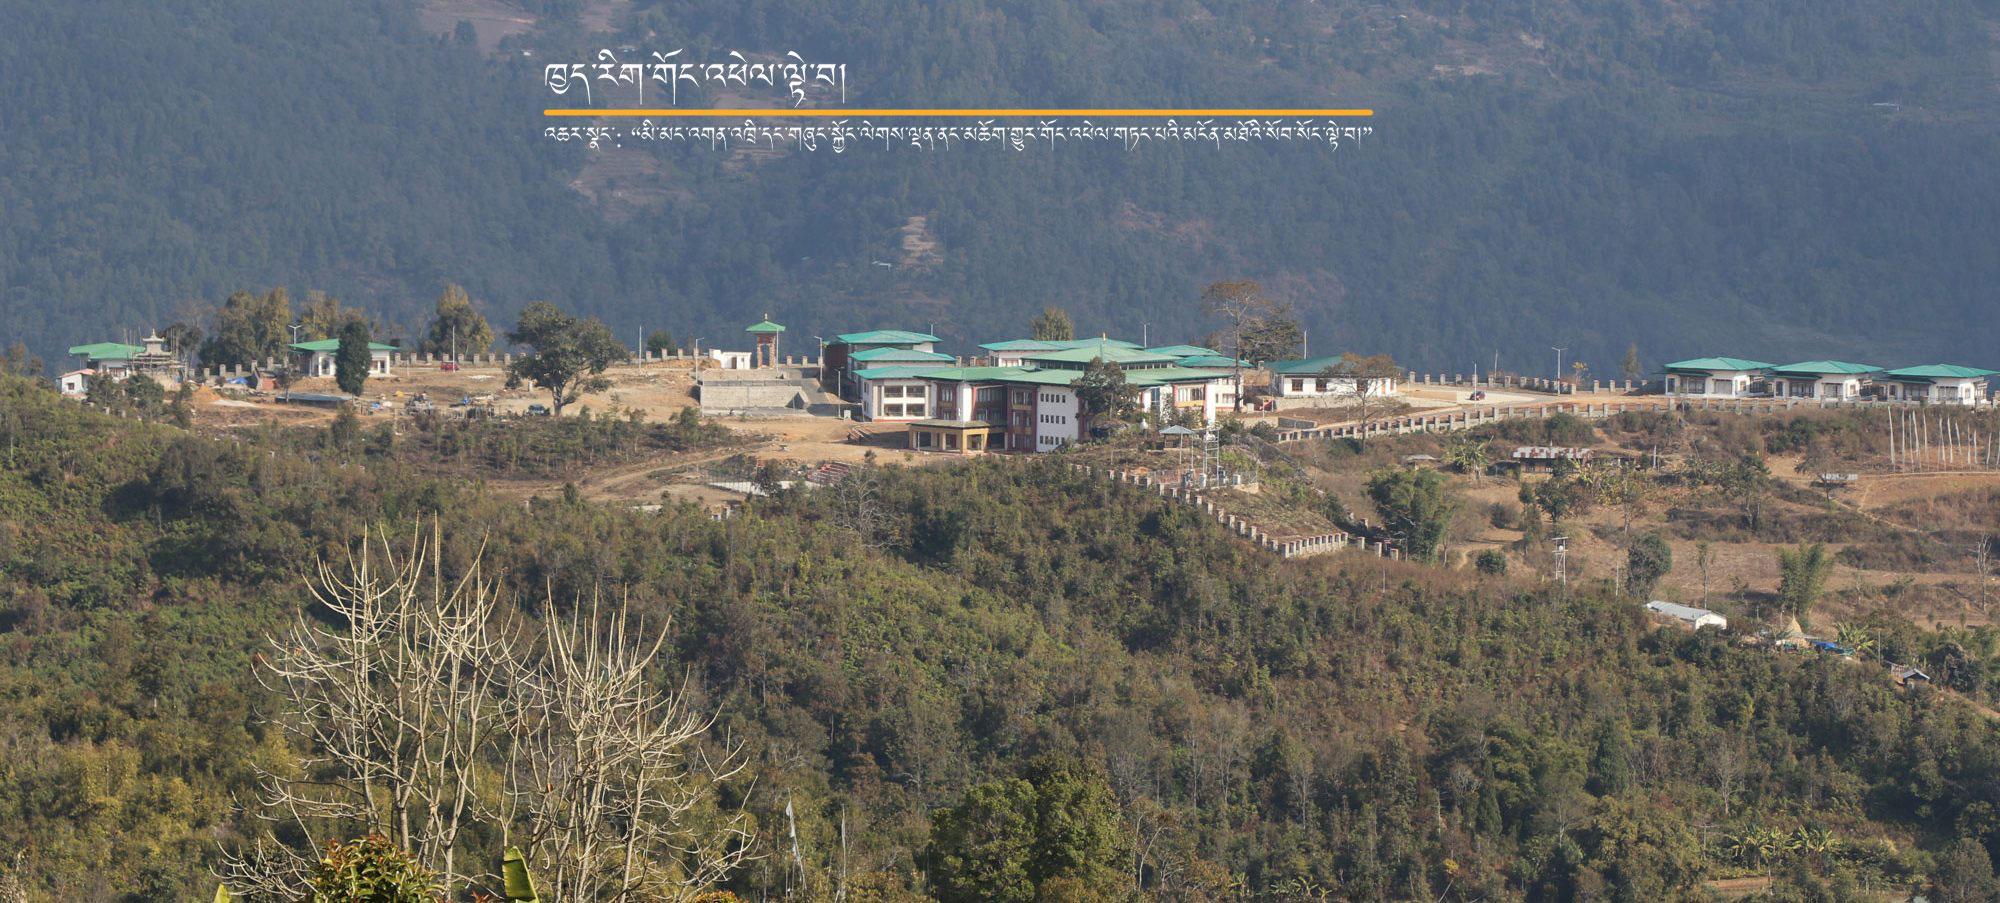 Professional Development Centre